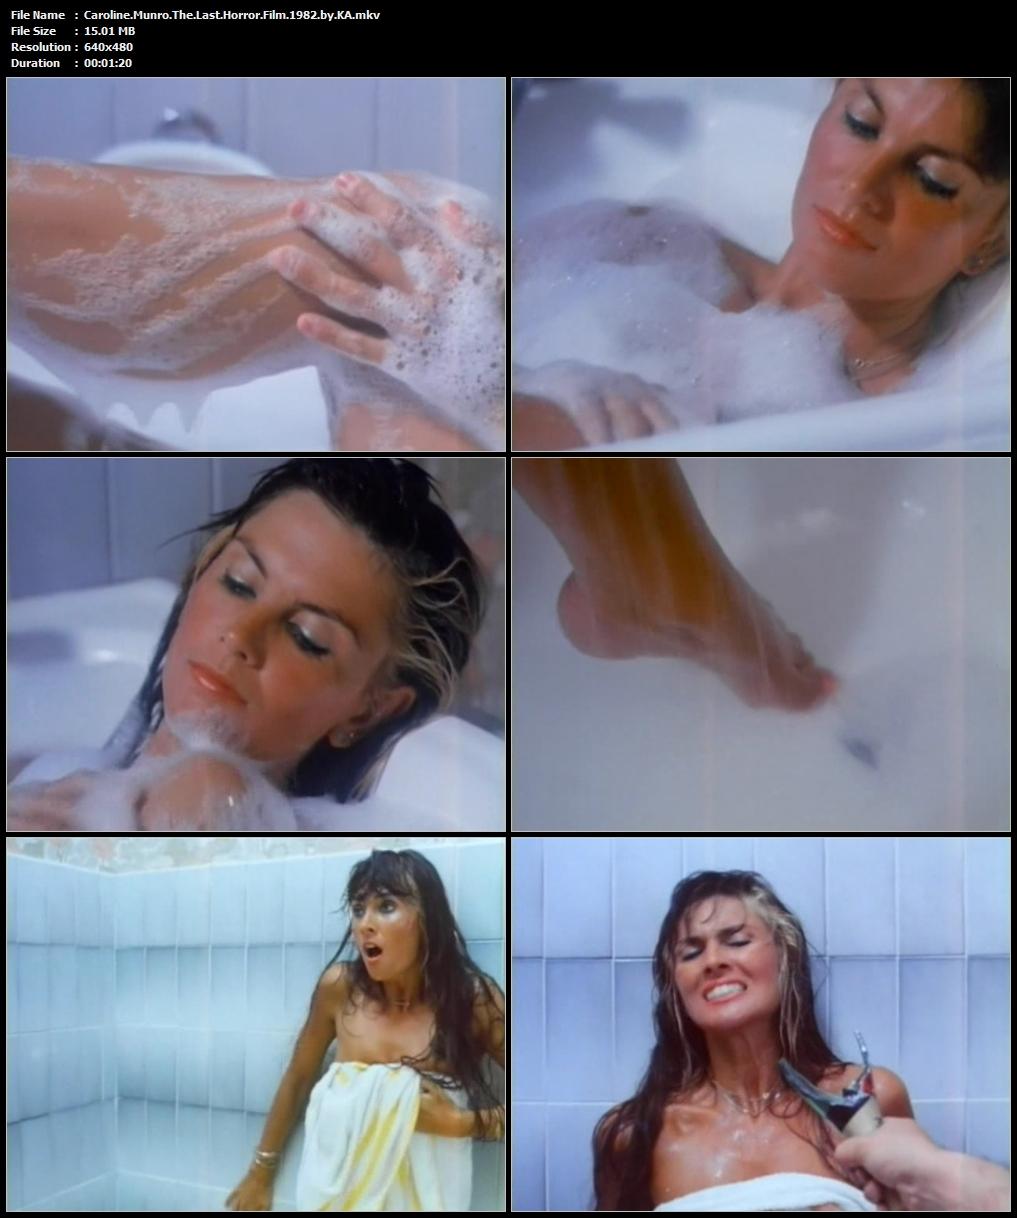 Caroline.Munro.The.Last.Horror.Film.1982.by.KA.mkv